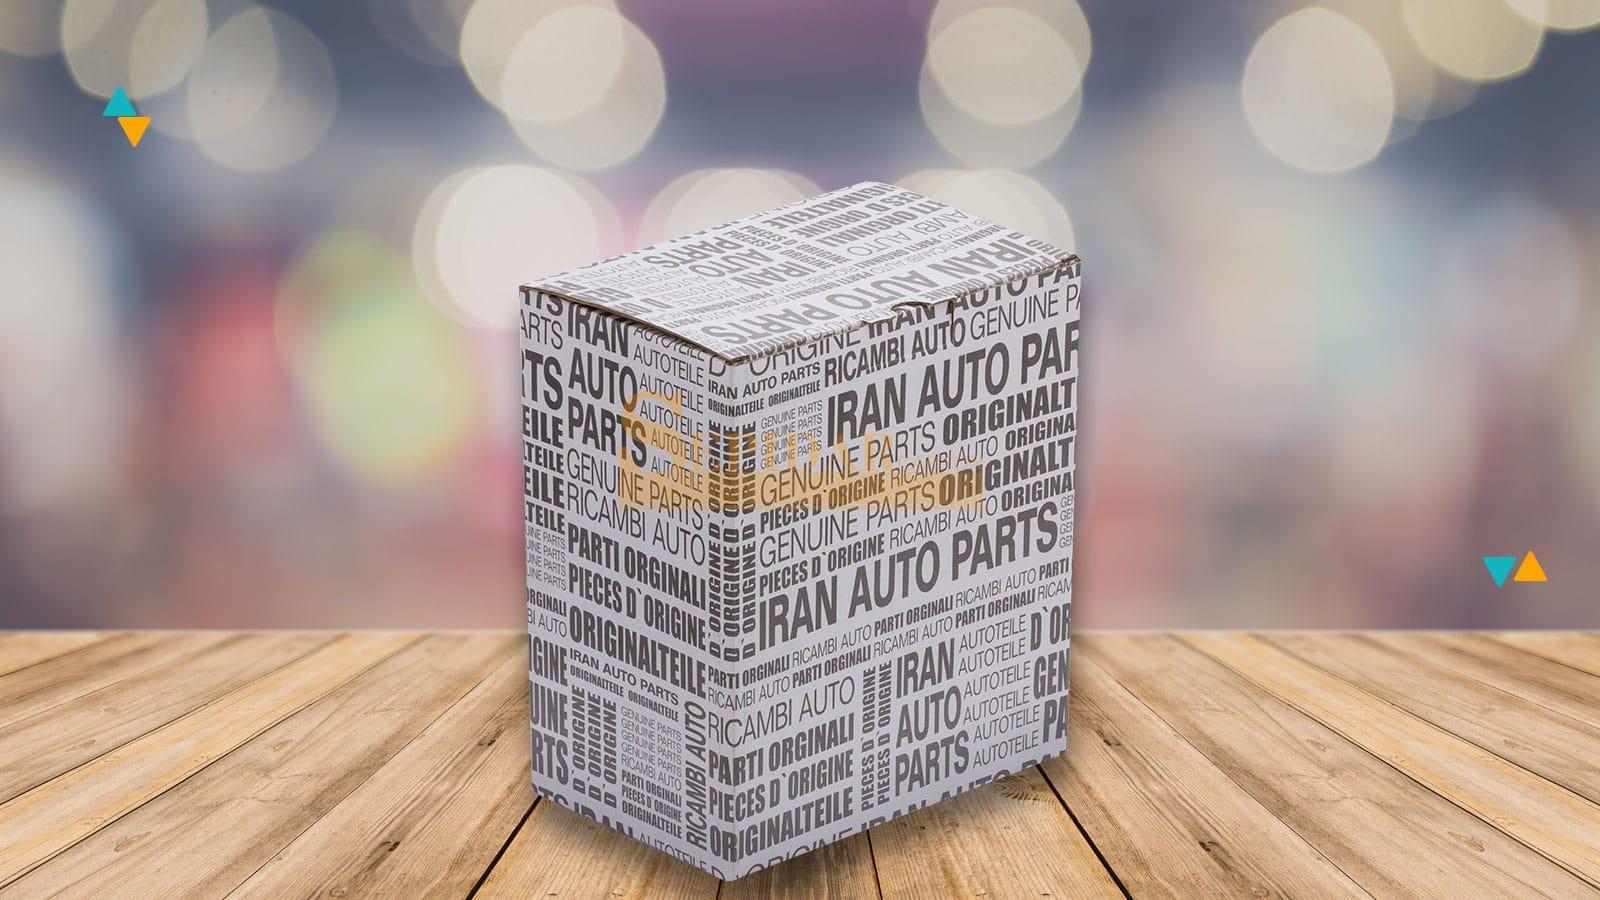 iran auto parts